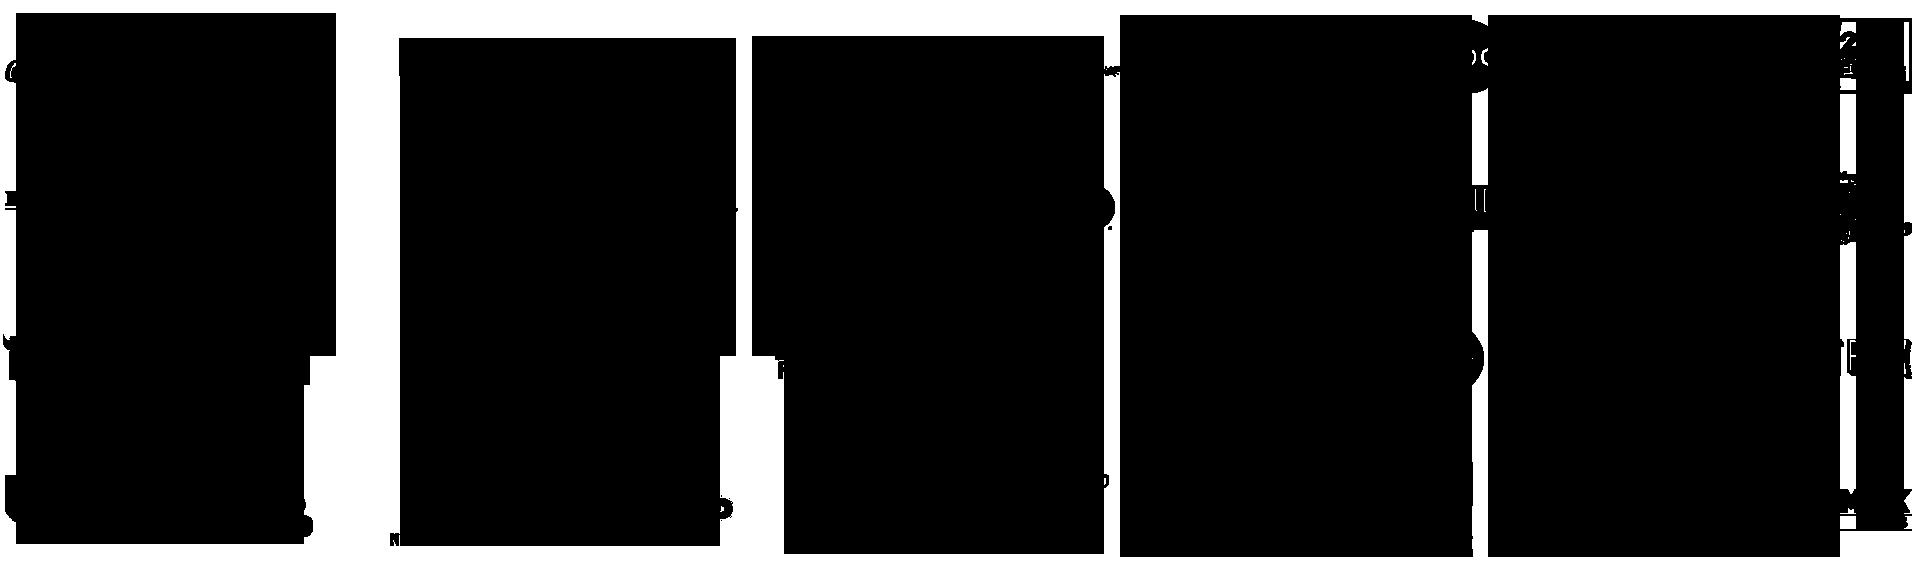 GKP-clients-logos